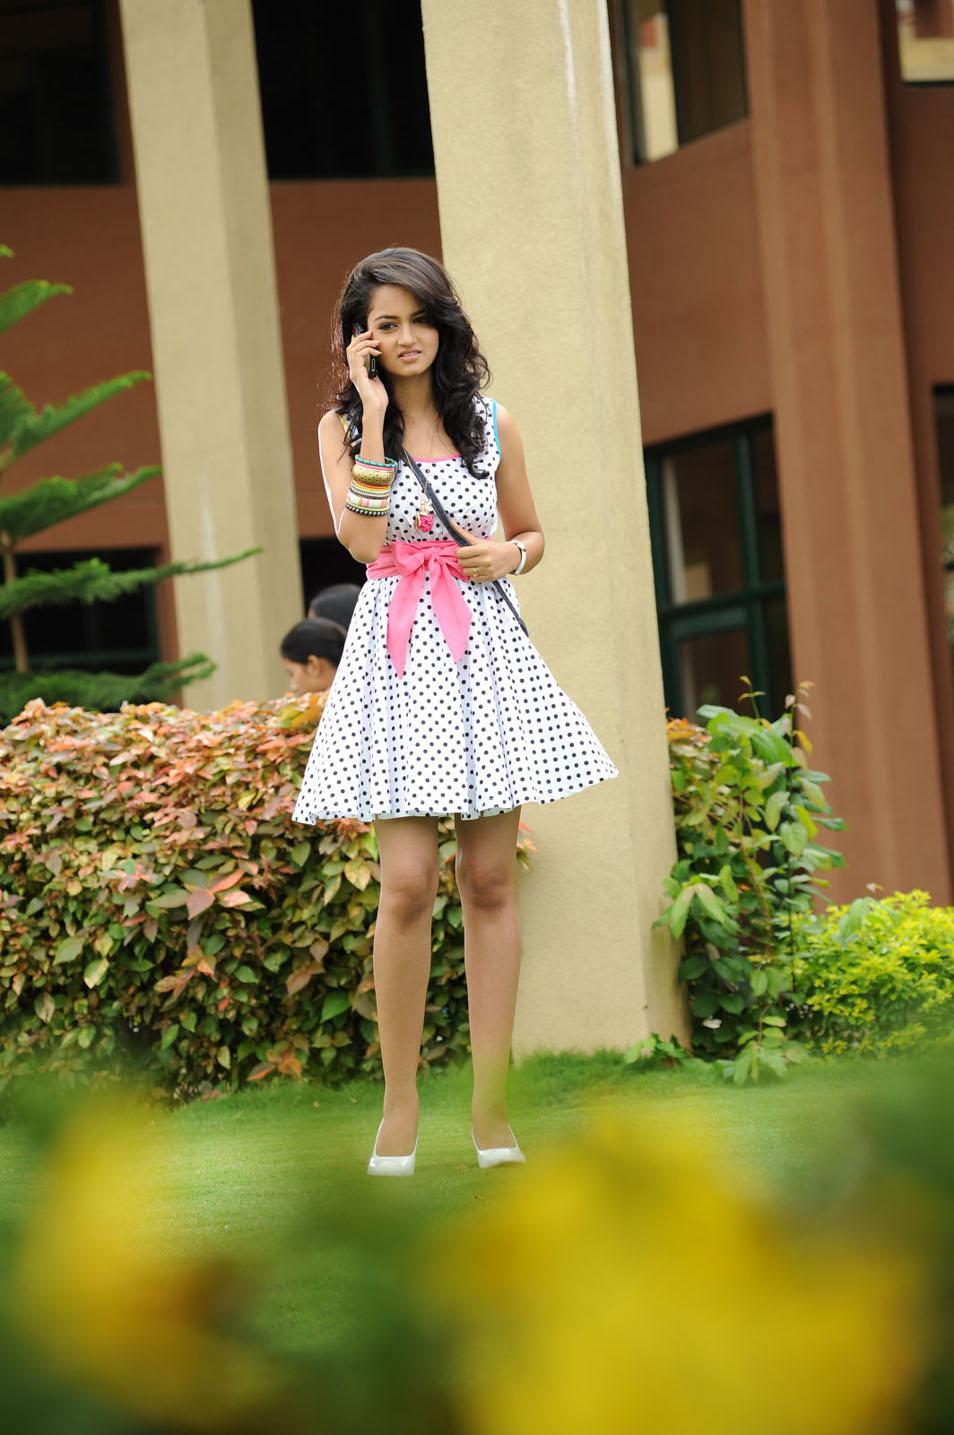 Shanvi from Adda Movie Photo Gallery Shanvi12